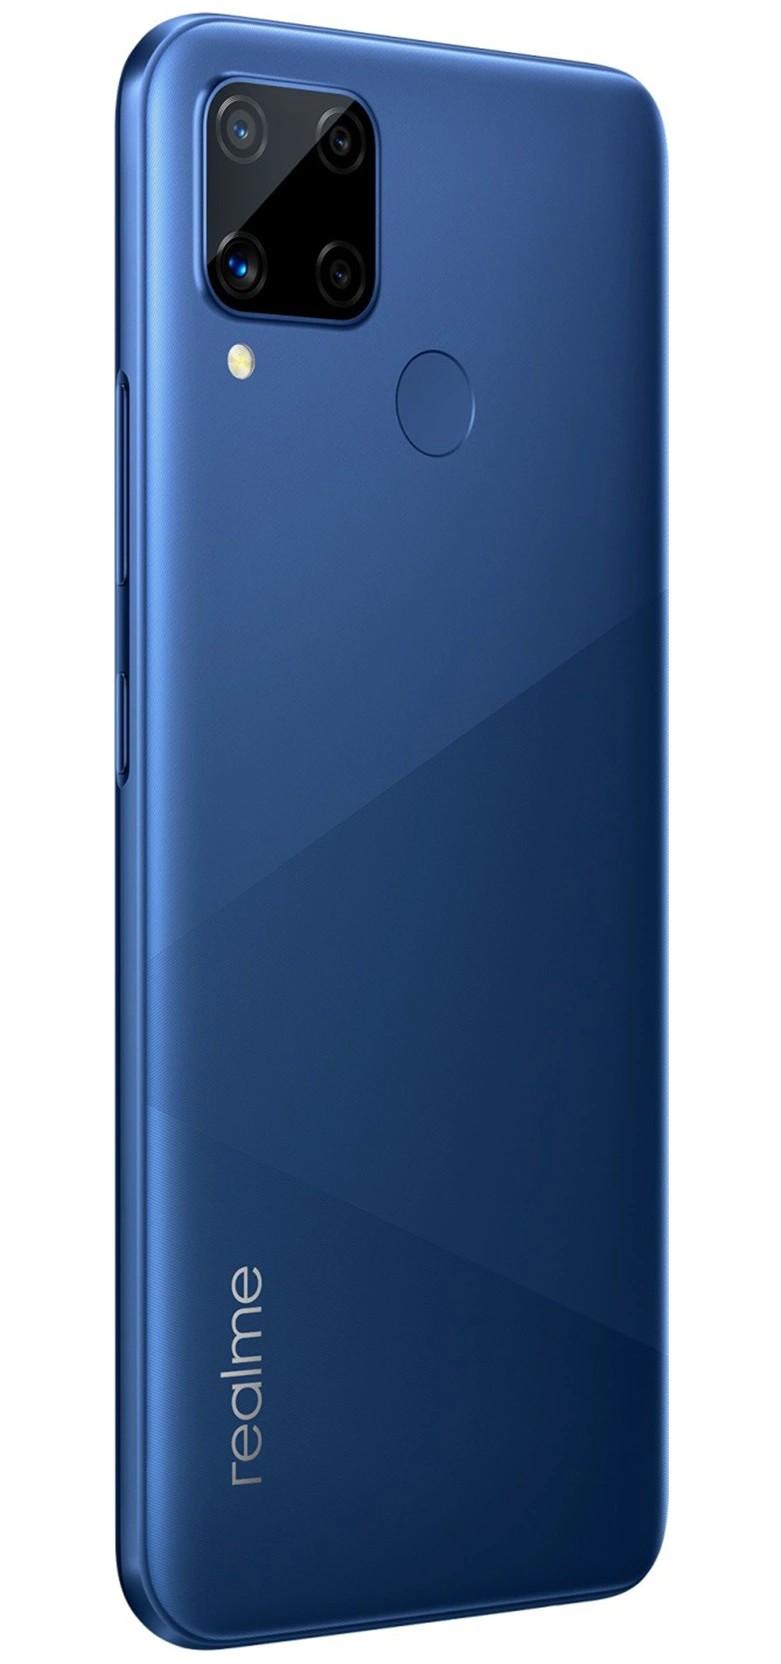 Realme C15 4/64GB Blue - 3